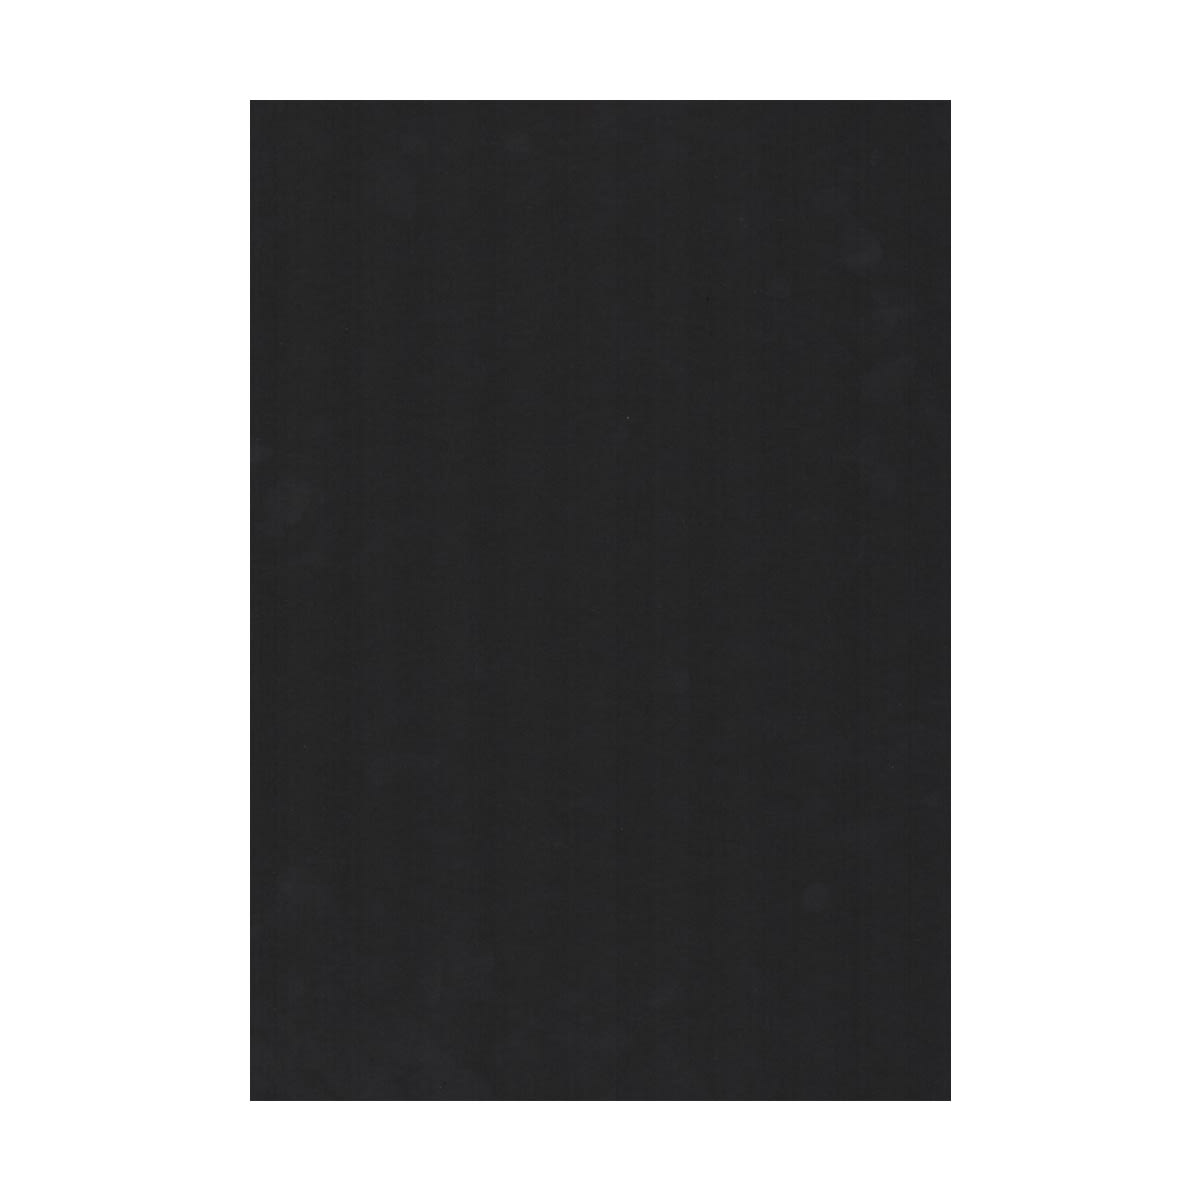 A3 OLD SCHOOL BLACK CARD 210GSM